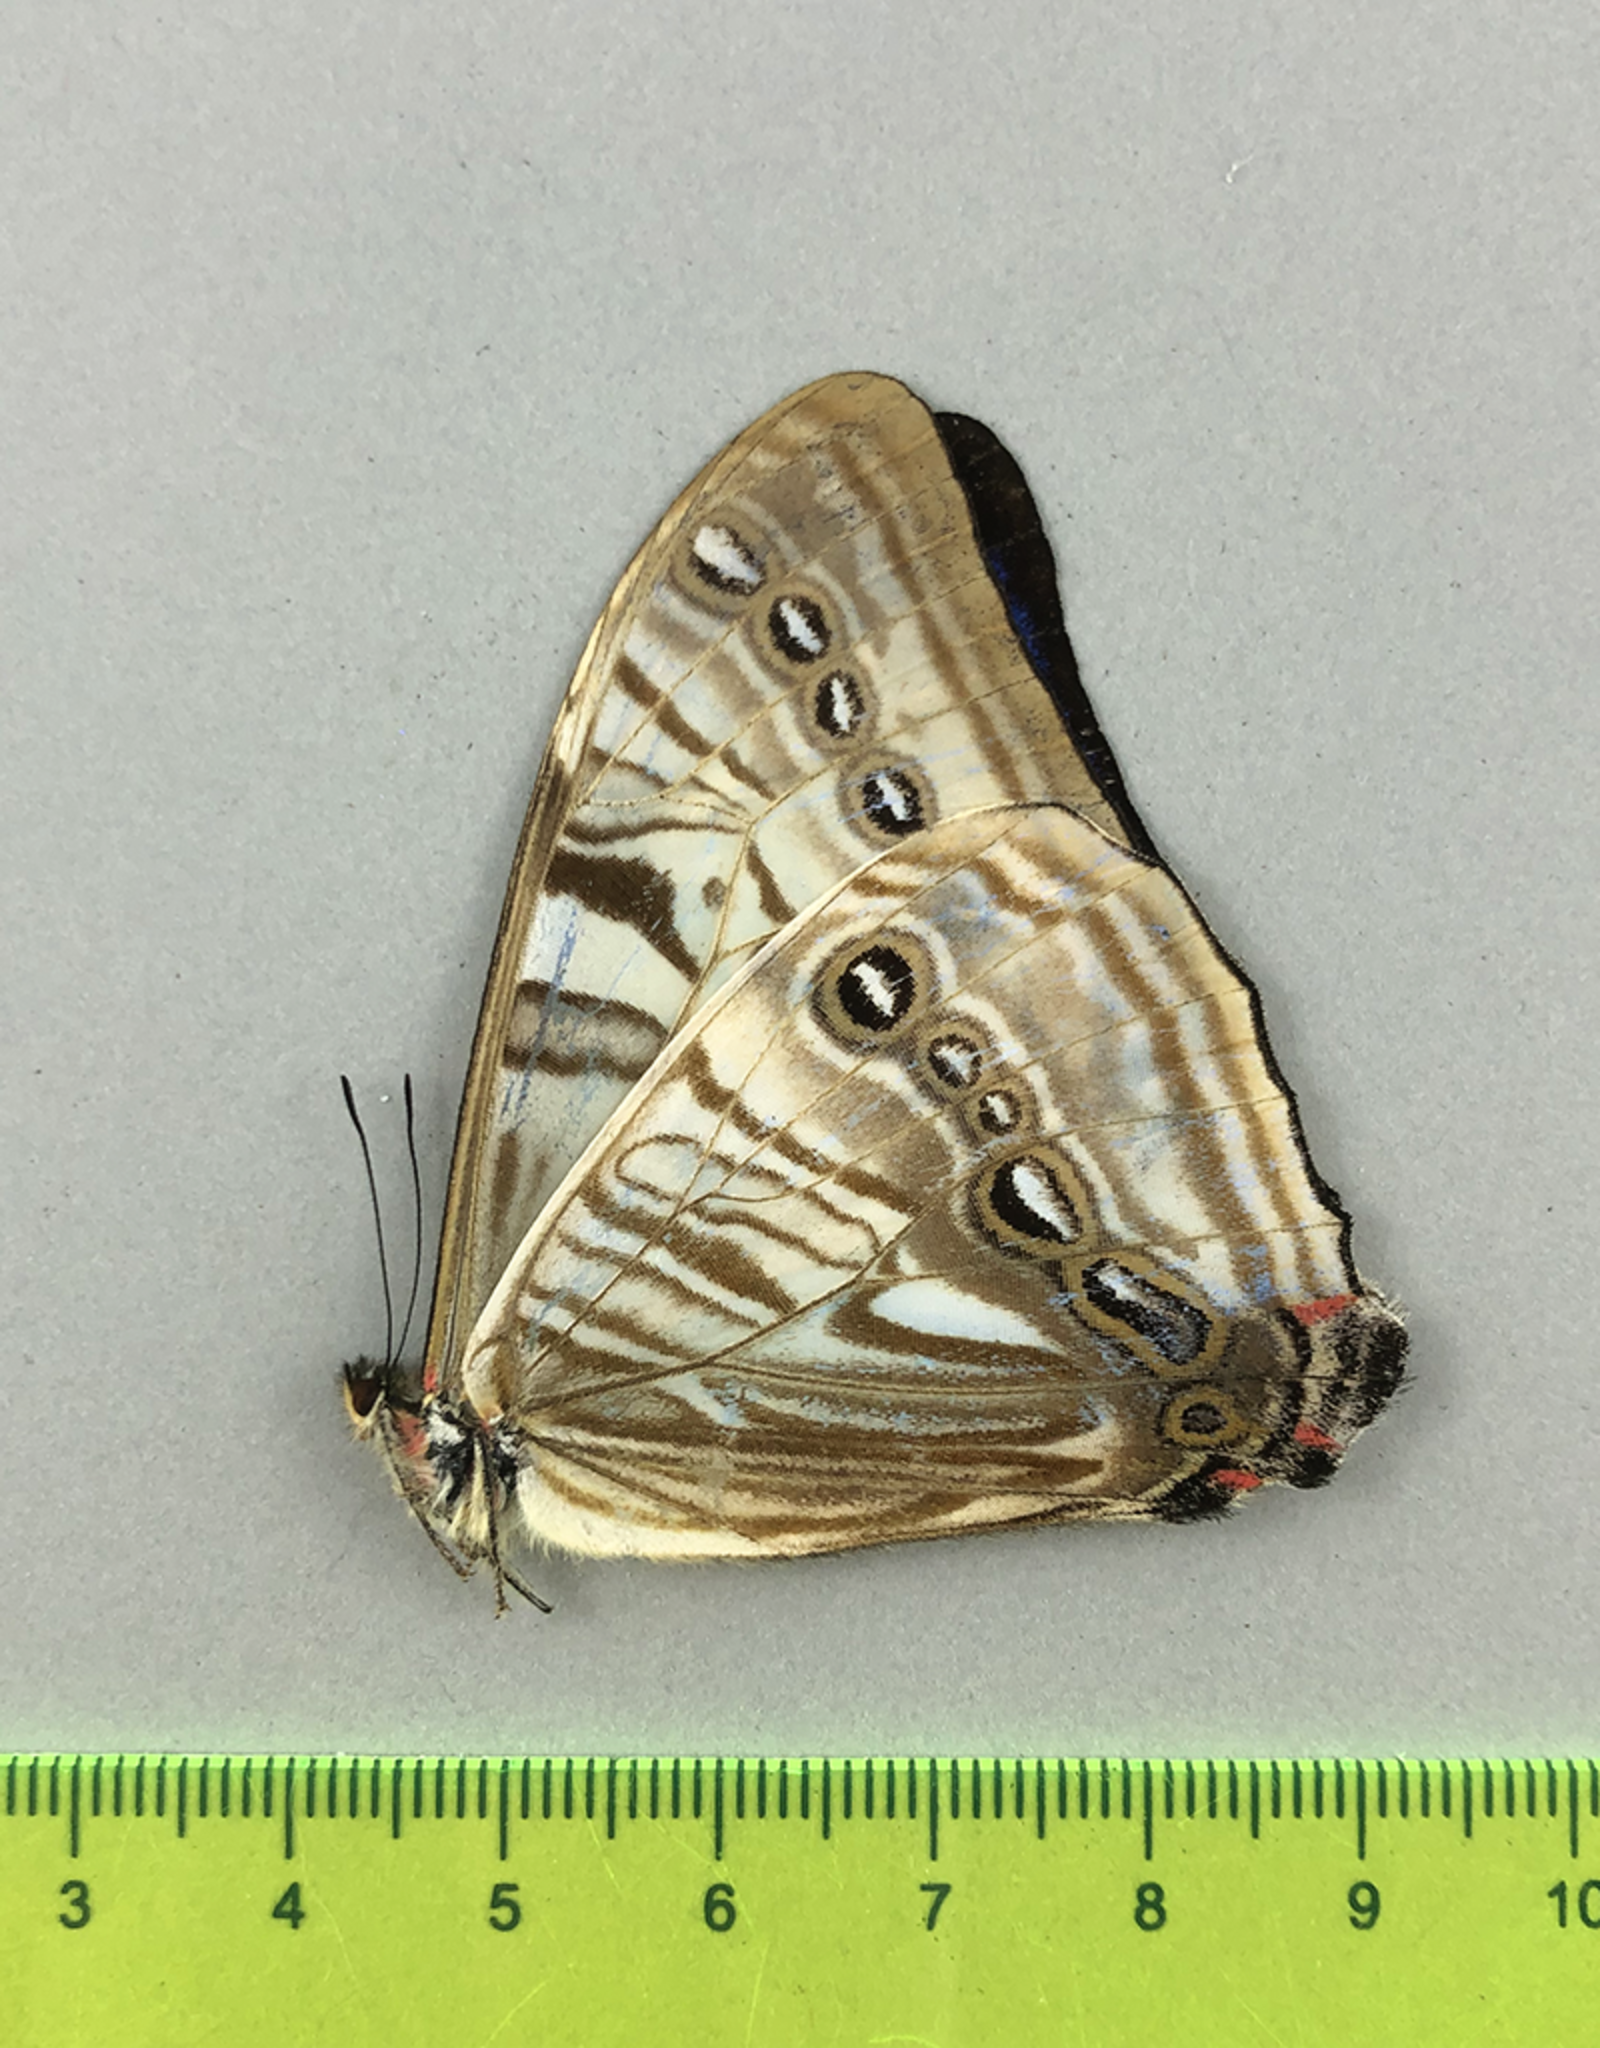 Morpho sulkowskyi descimokoenigi M A1/A1- Cuzco, Peru